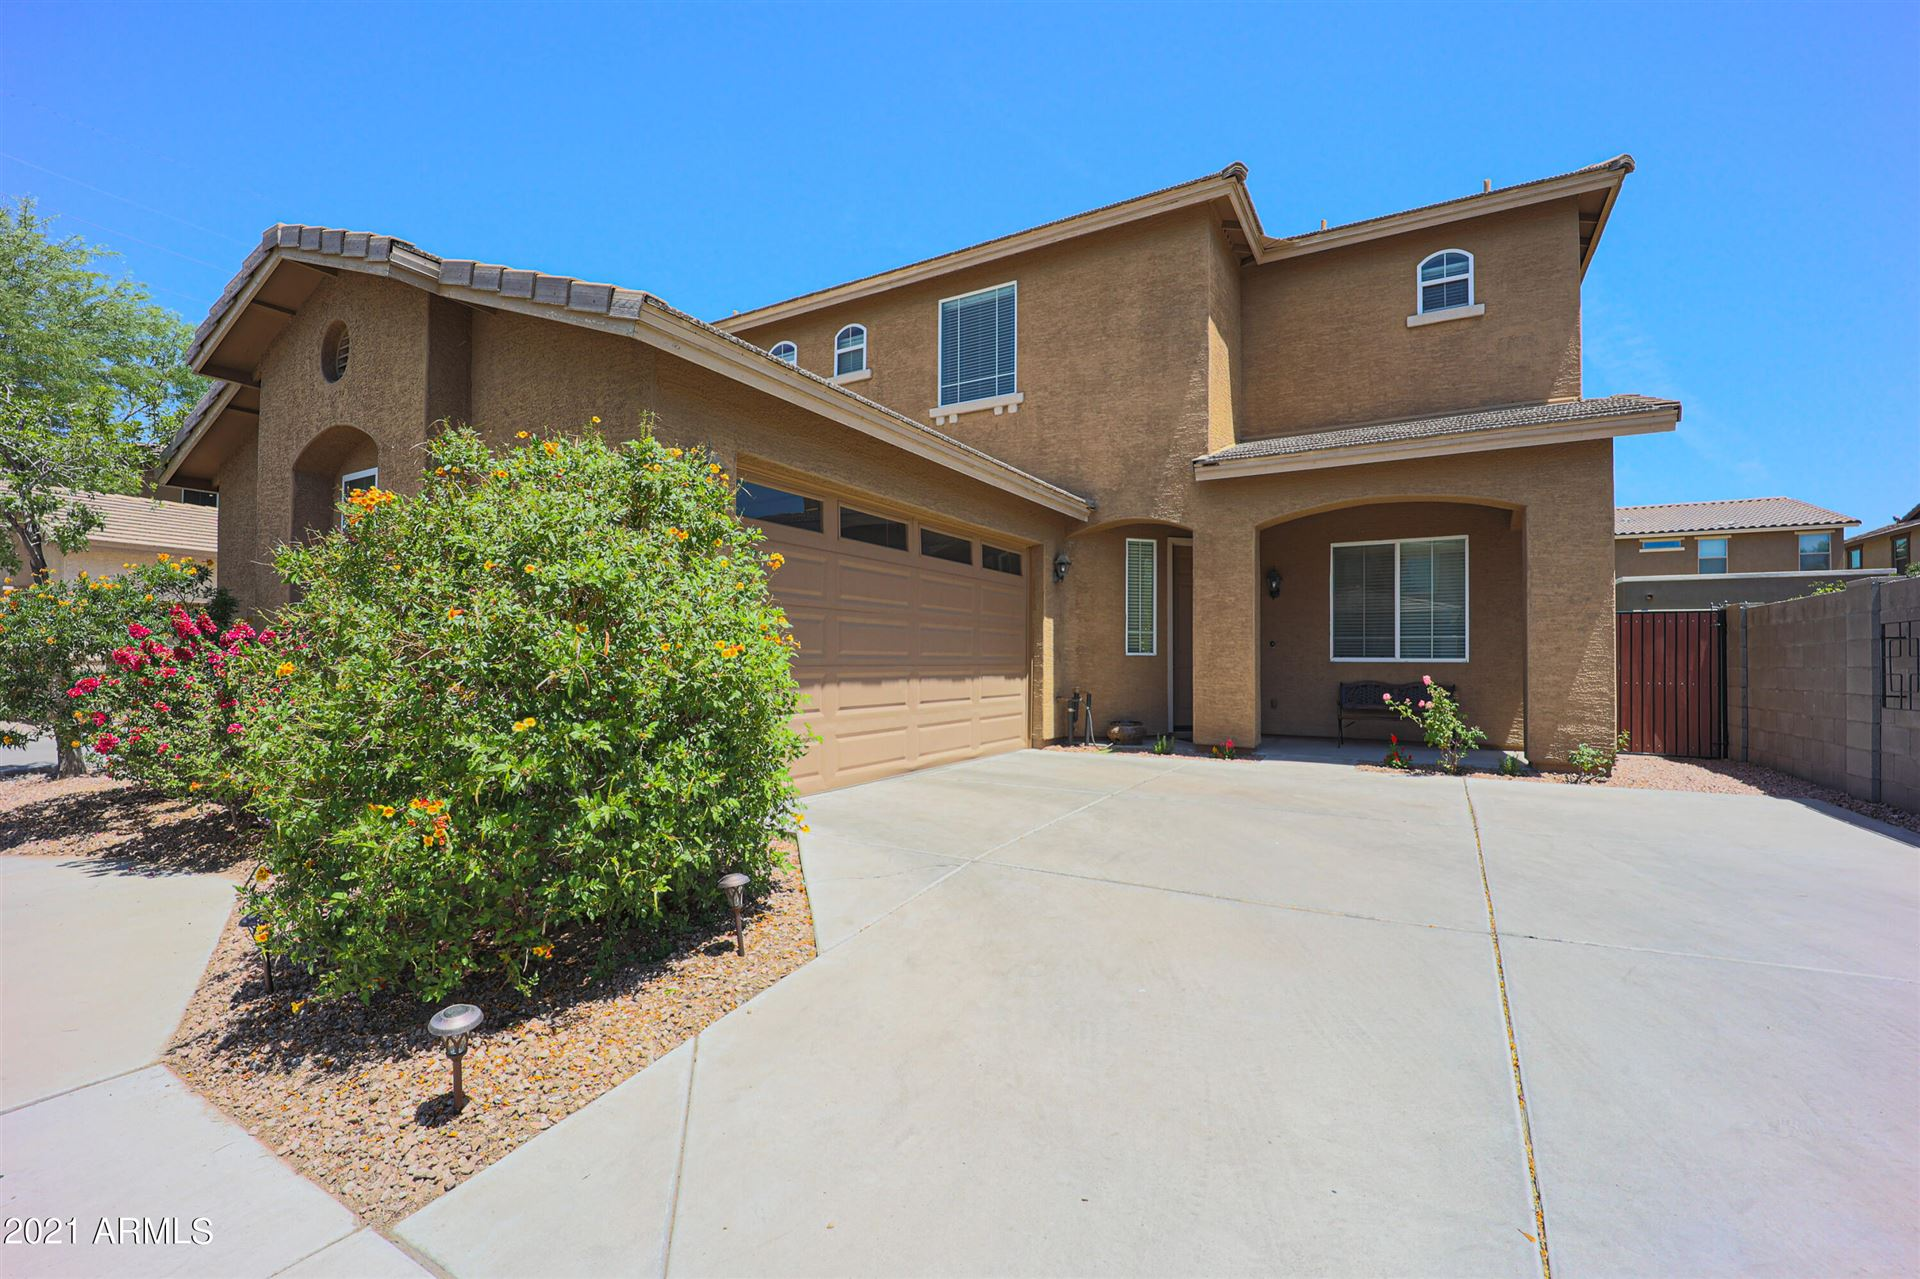 7413 S 27TH Terrace, Phoenix, AZ 85042 - MLS#: 6248076